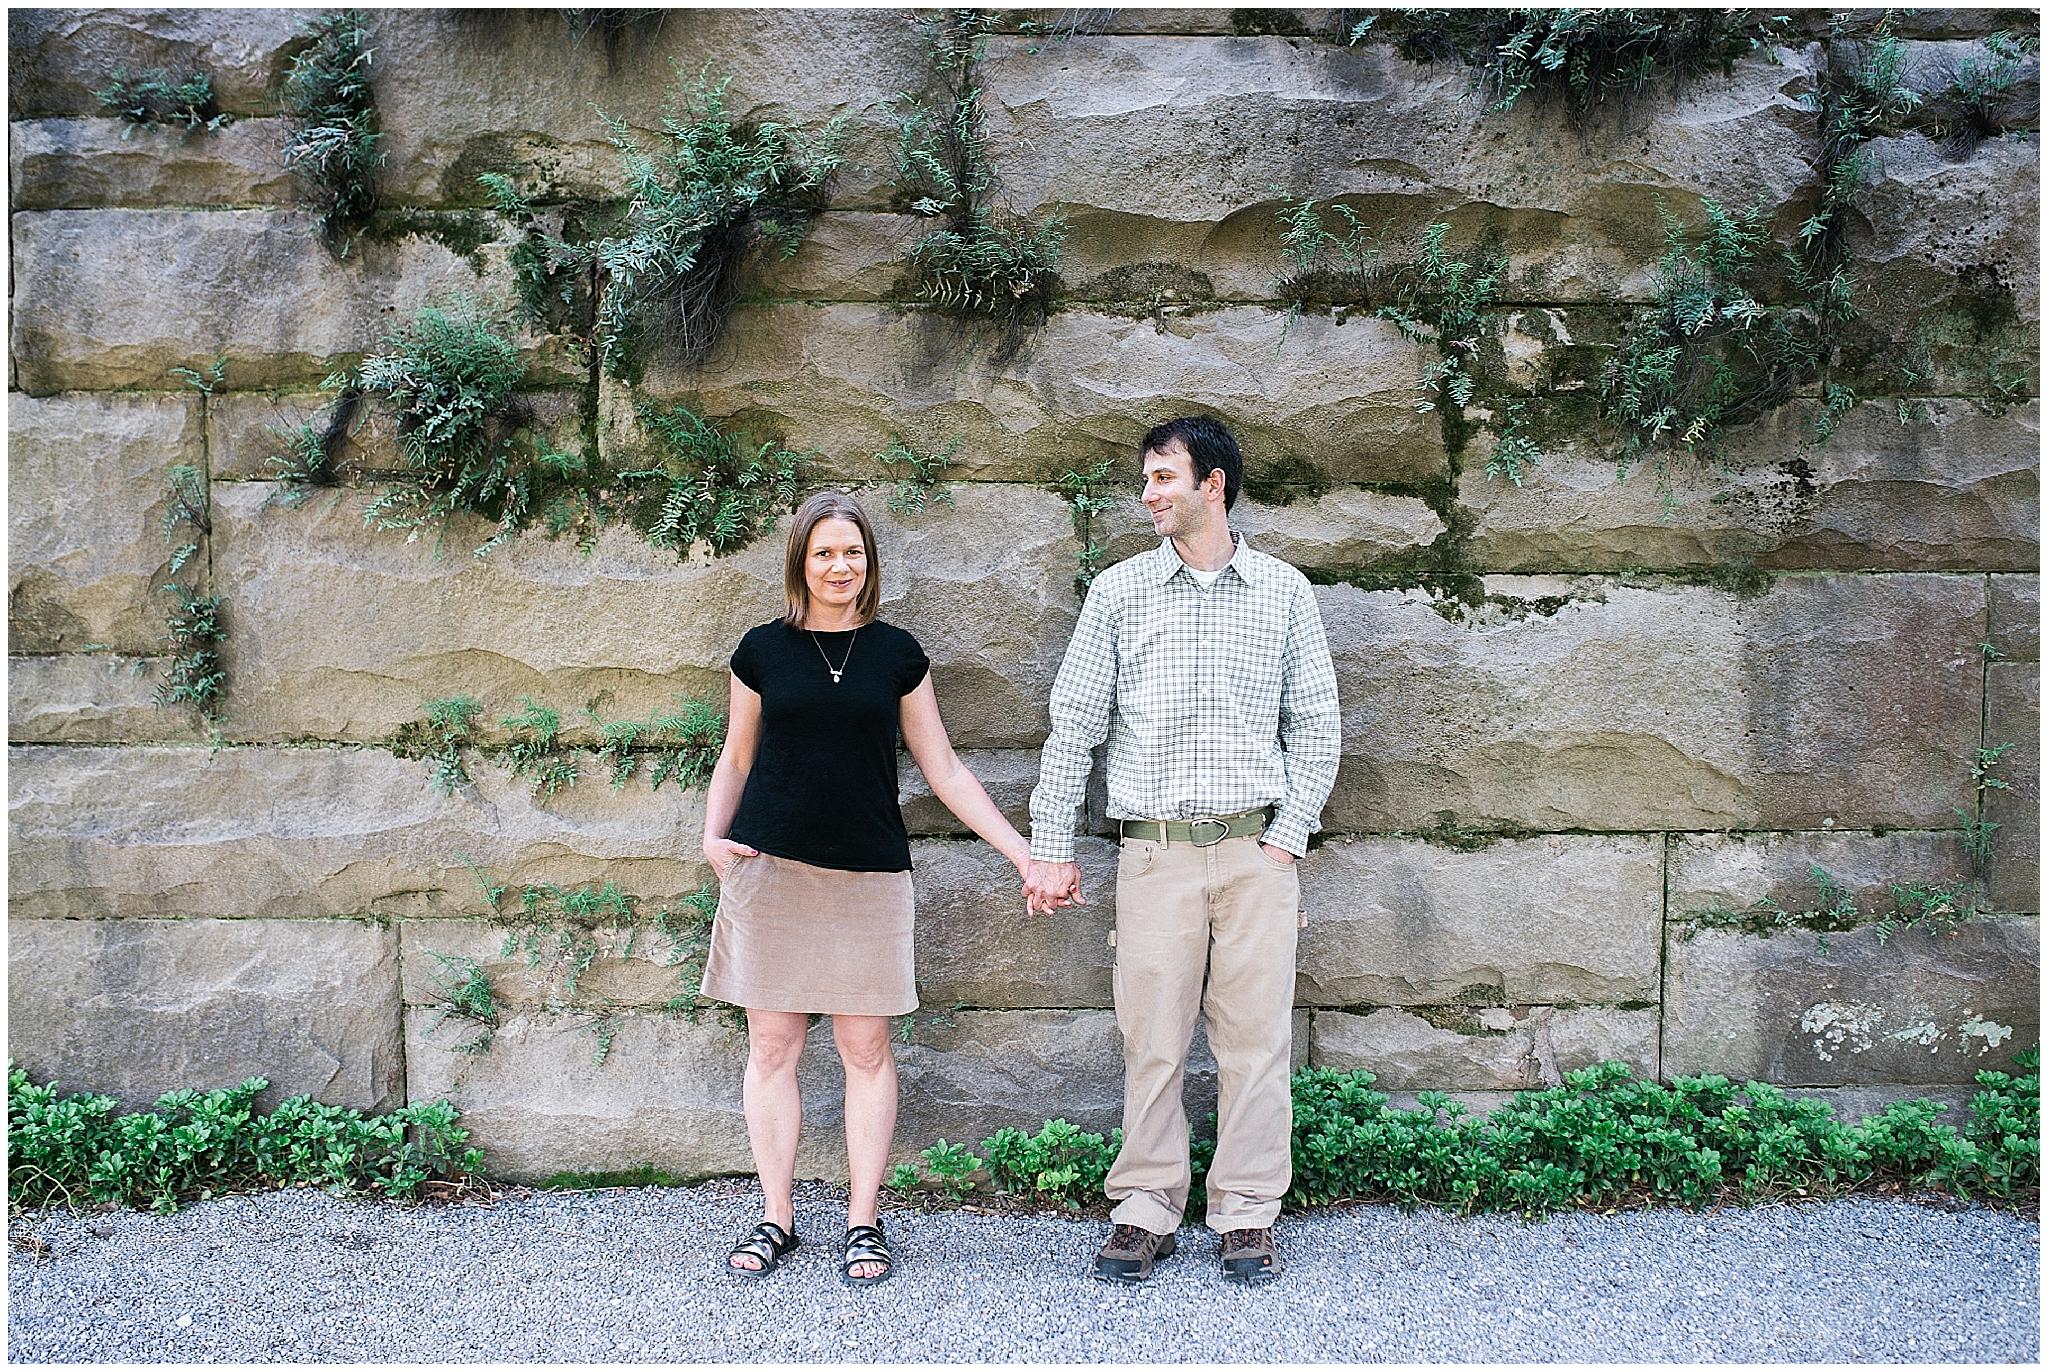 Biltmore_engagement_Asheville_photographer_wedding_5.jpg